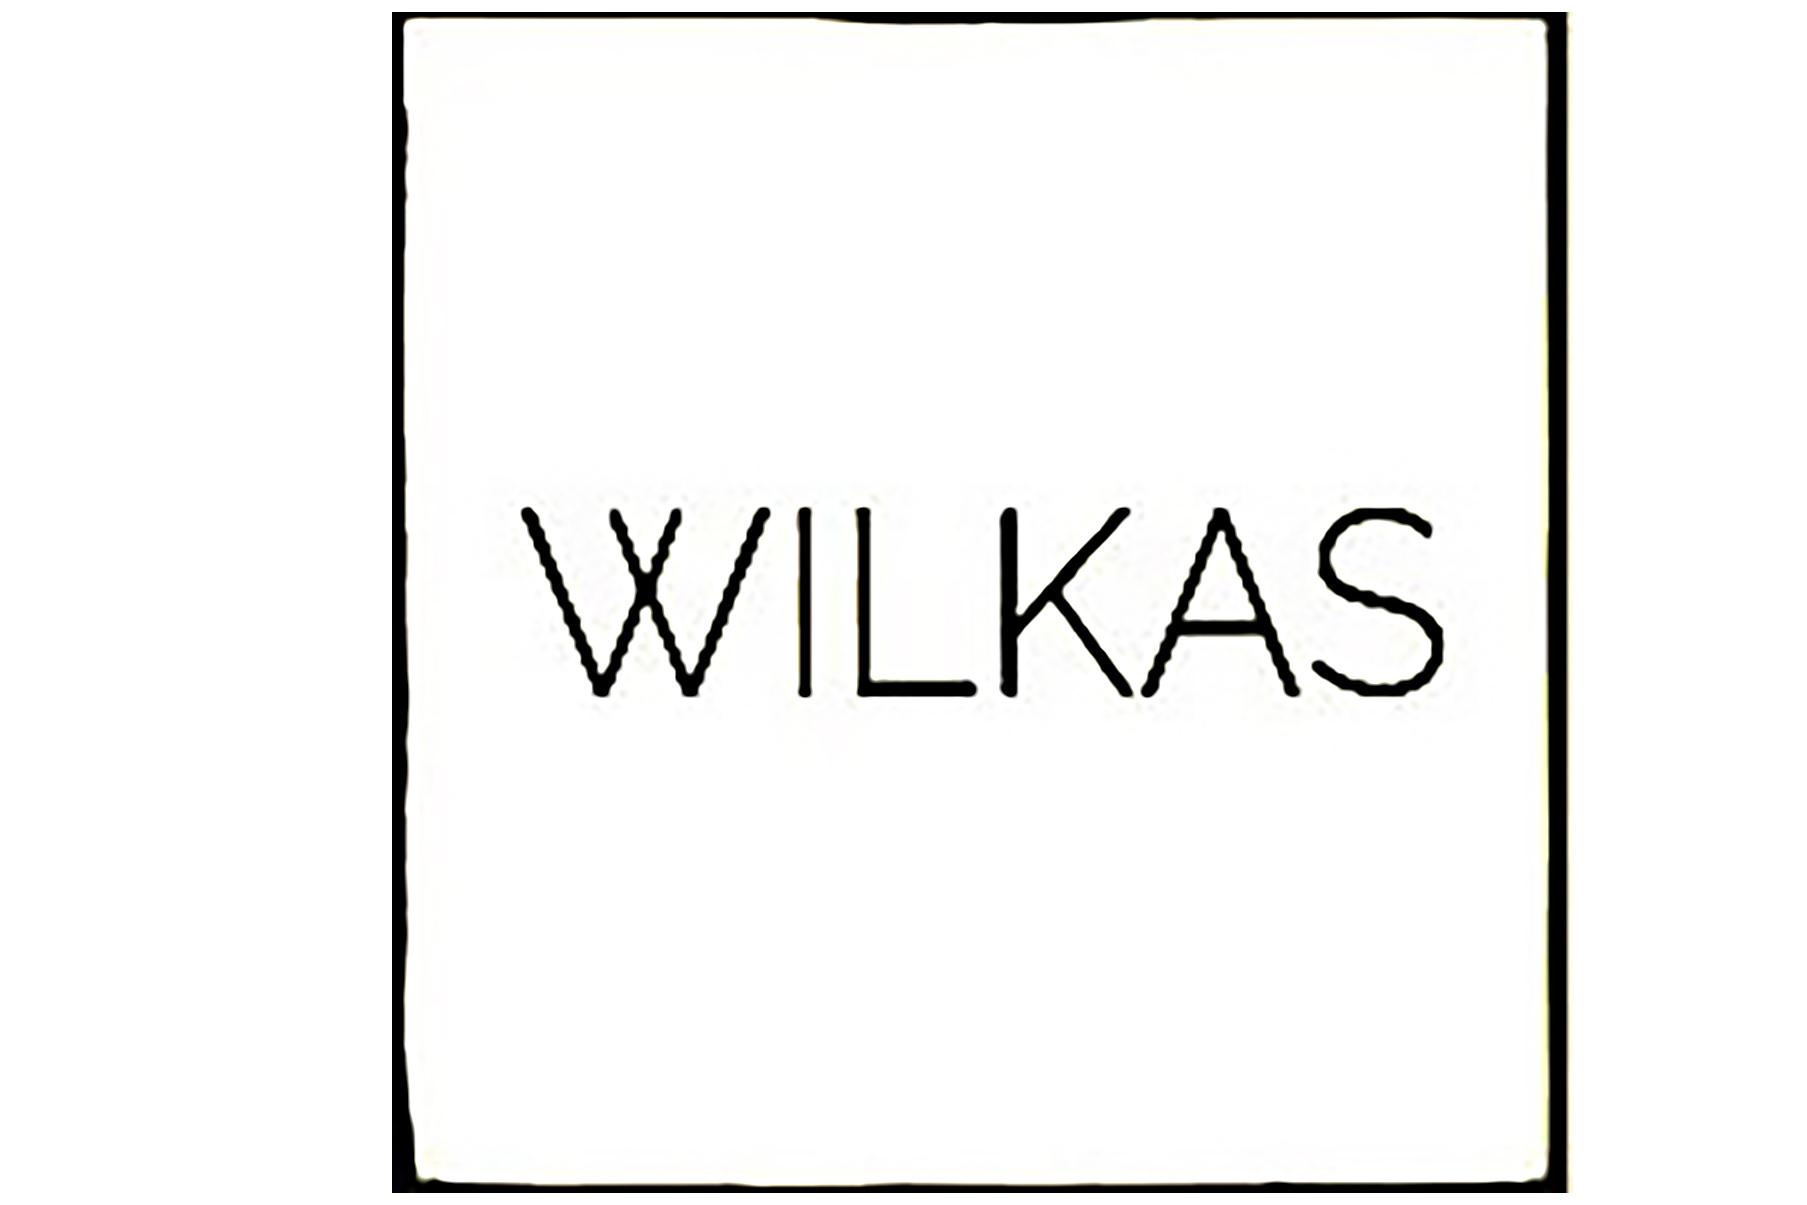 Wilkas logo